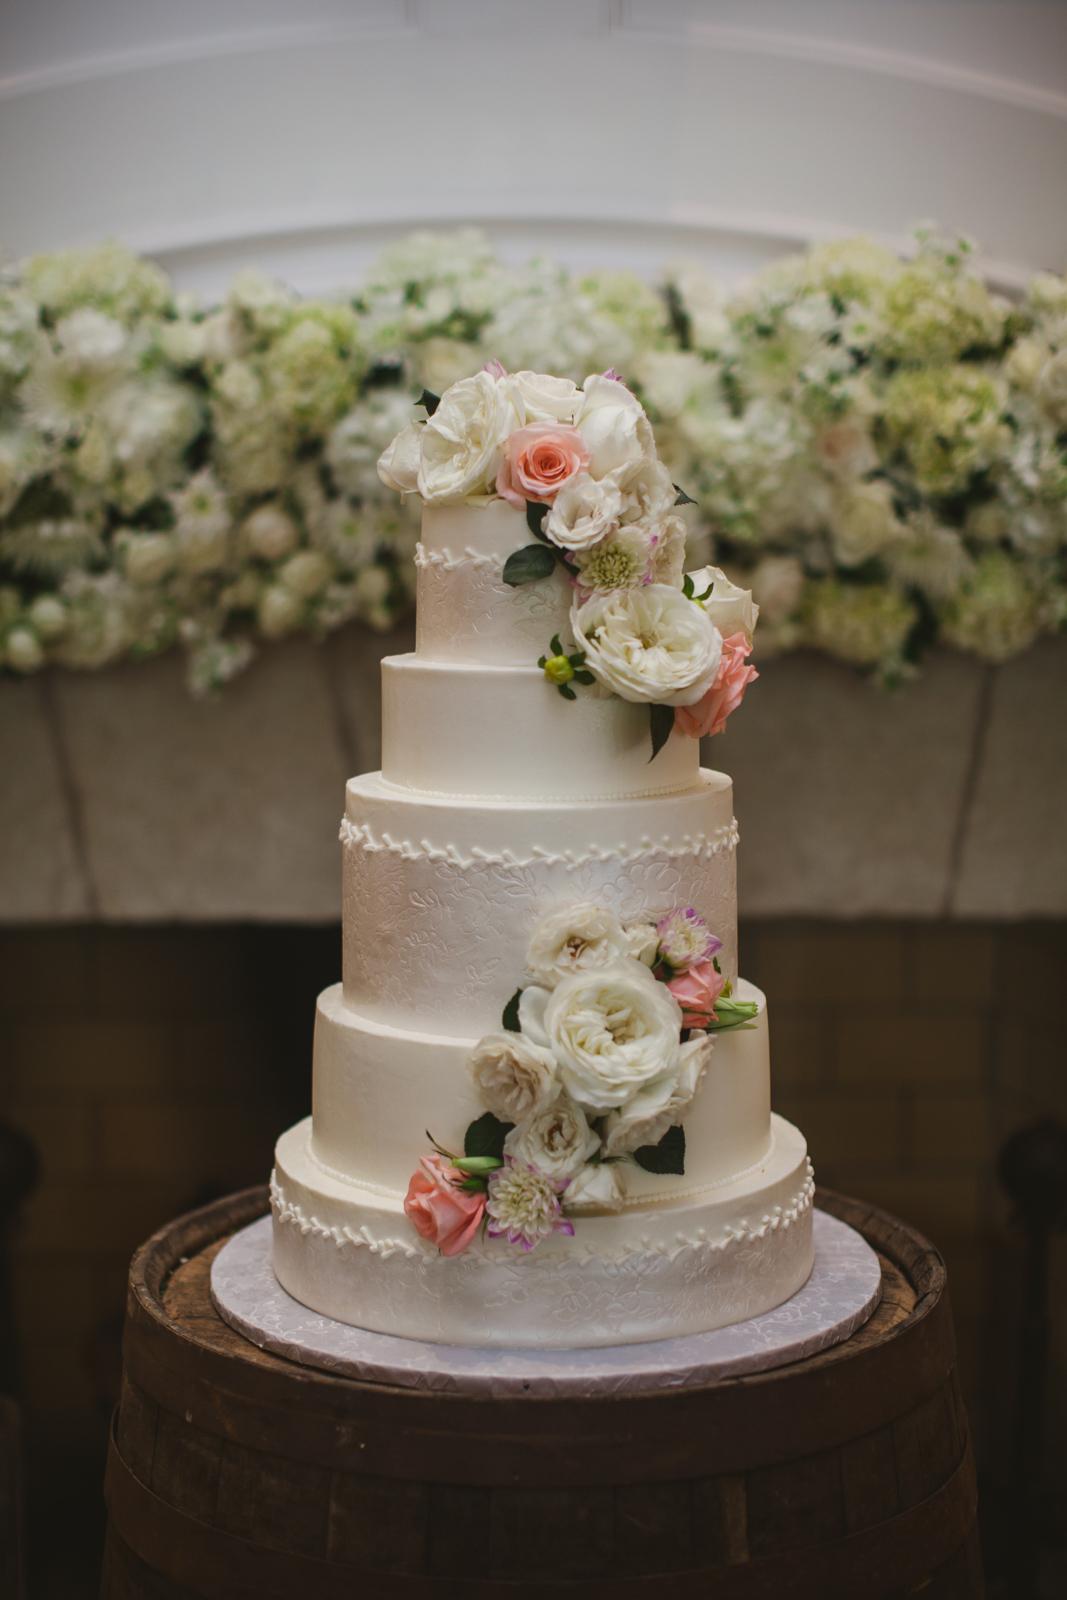 wedding cake with fresh flowers elizabeth anne designs the wedding blog. Black Bedroom Furniture Sets. Home Design Ideas